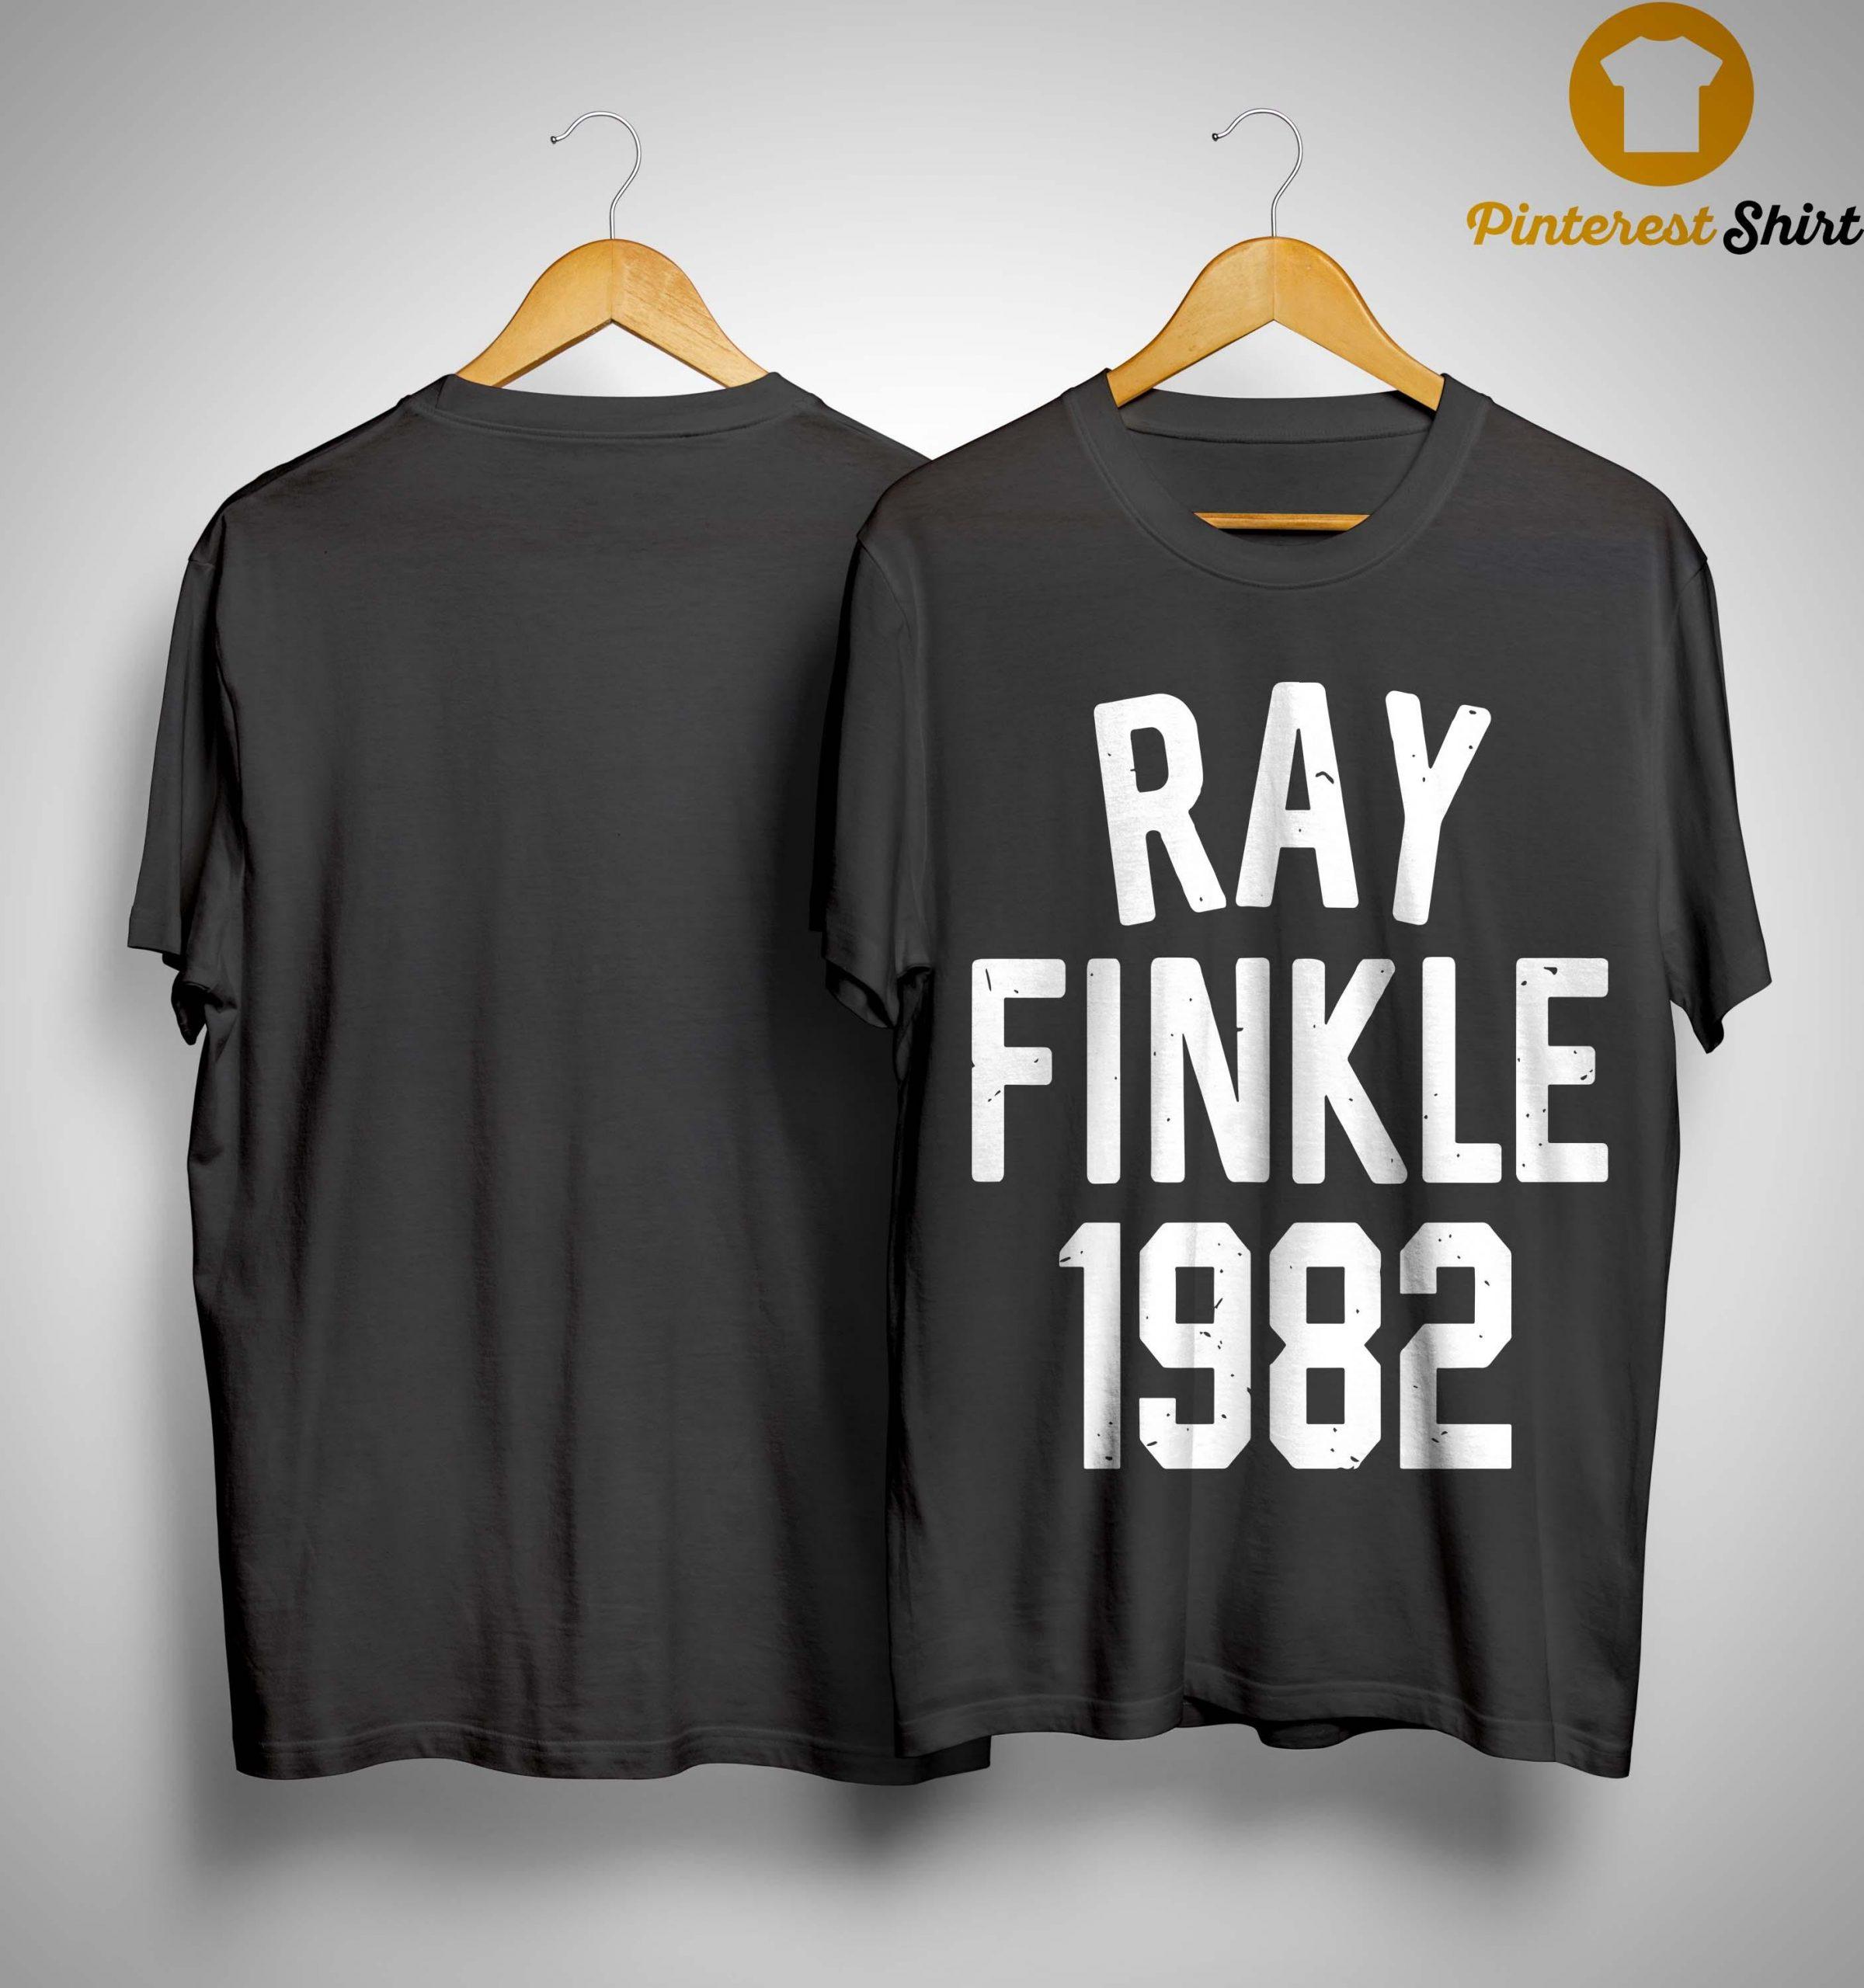 Ray Finkle 1982 Shirt